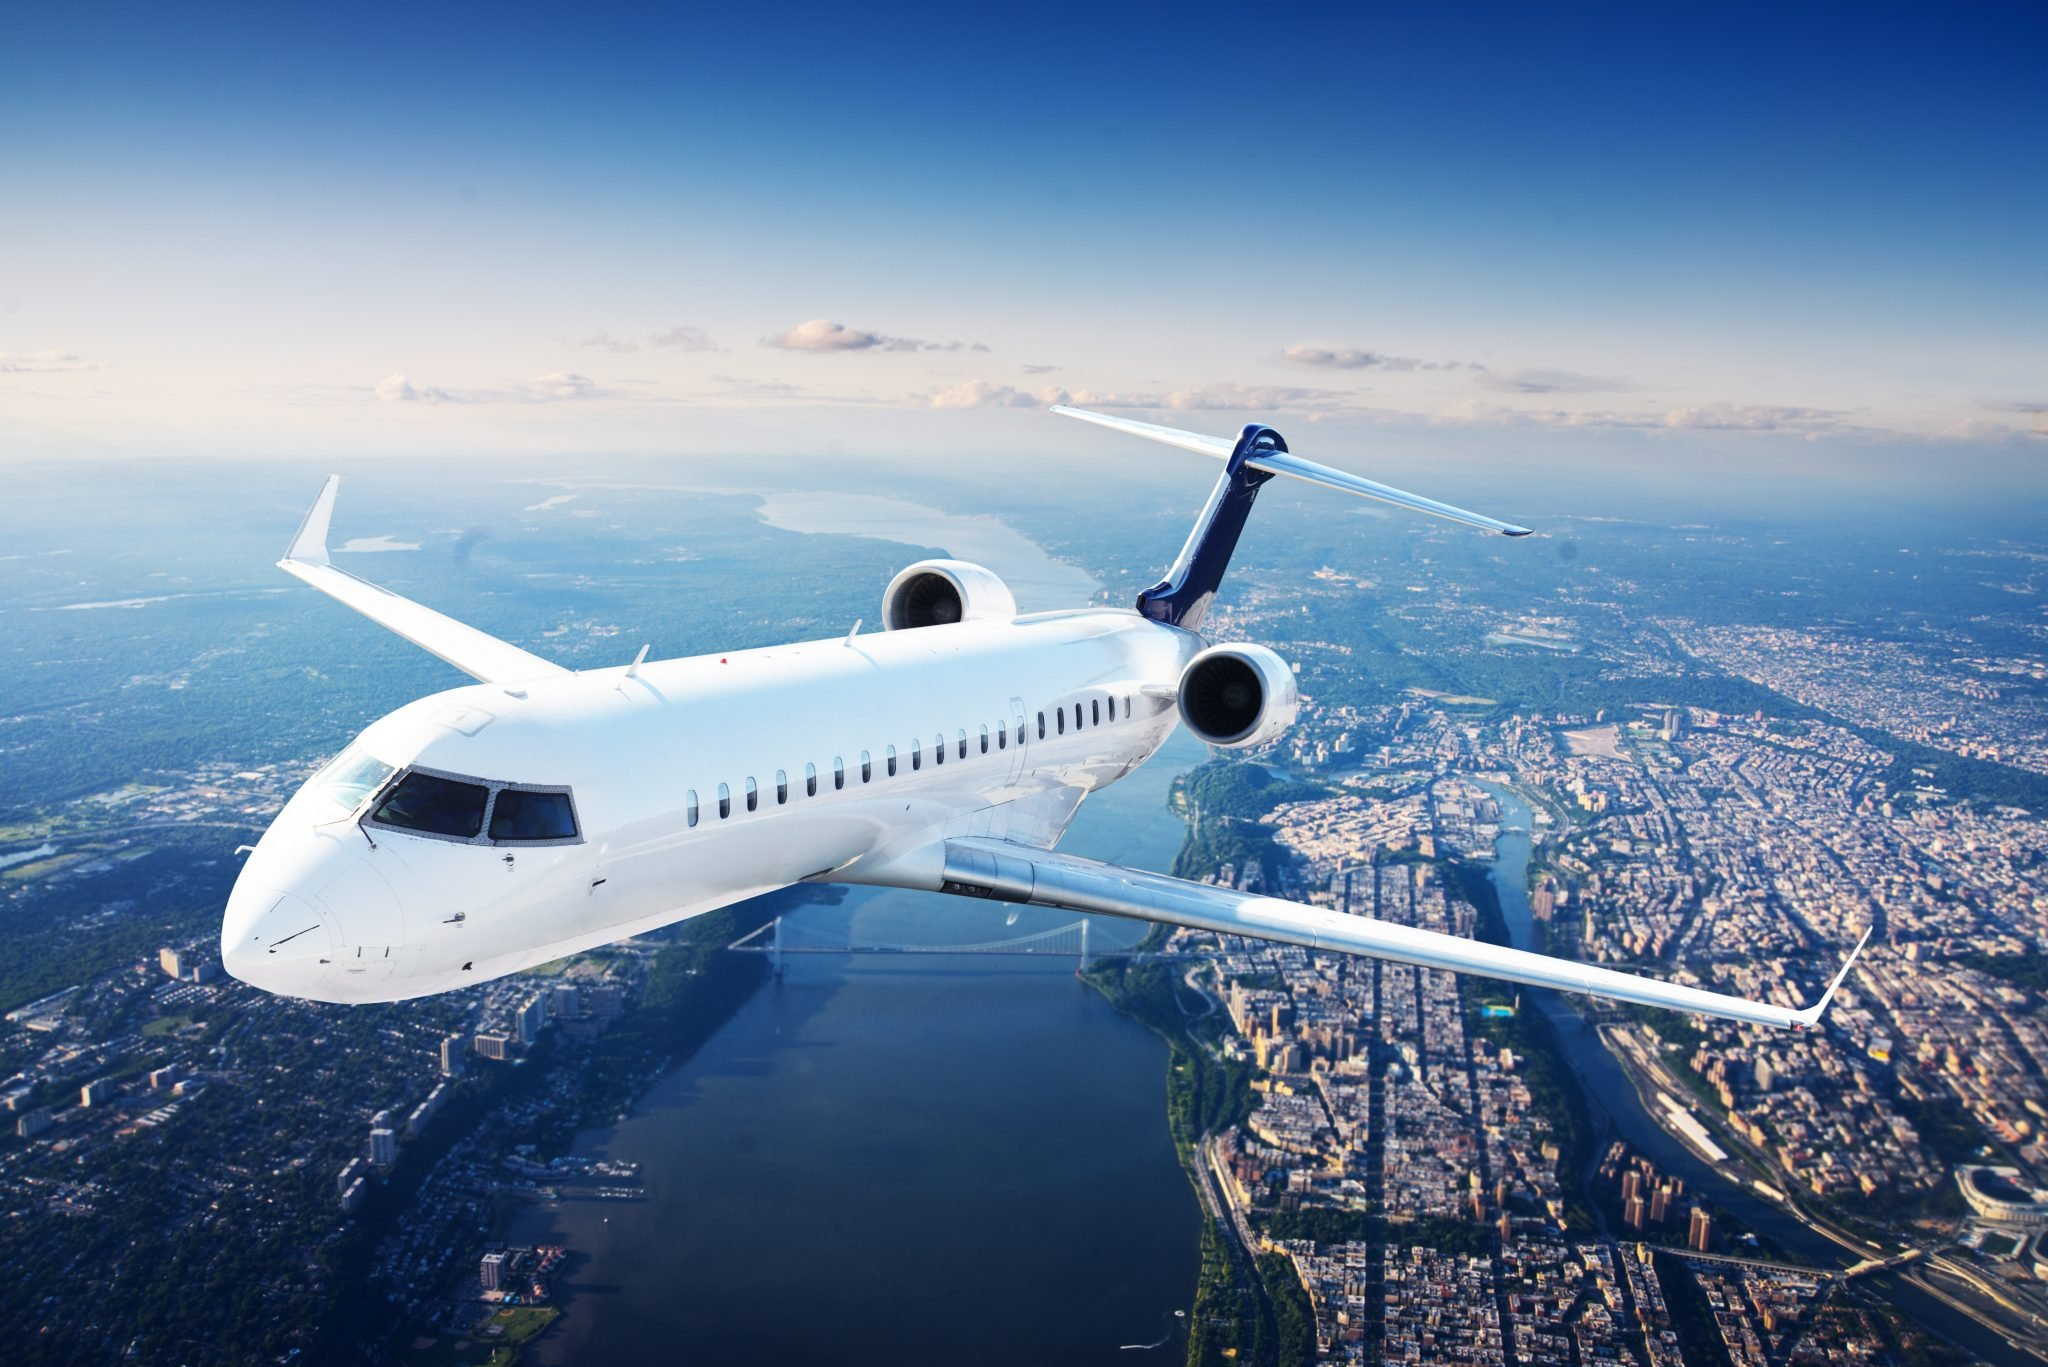 Private jet plane in the blue sky